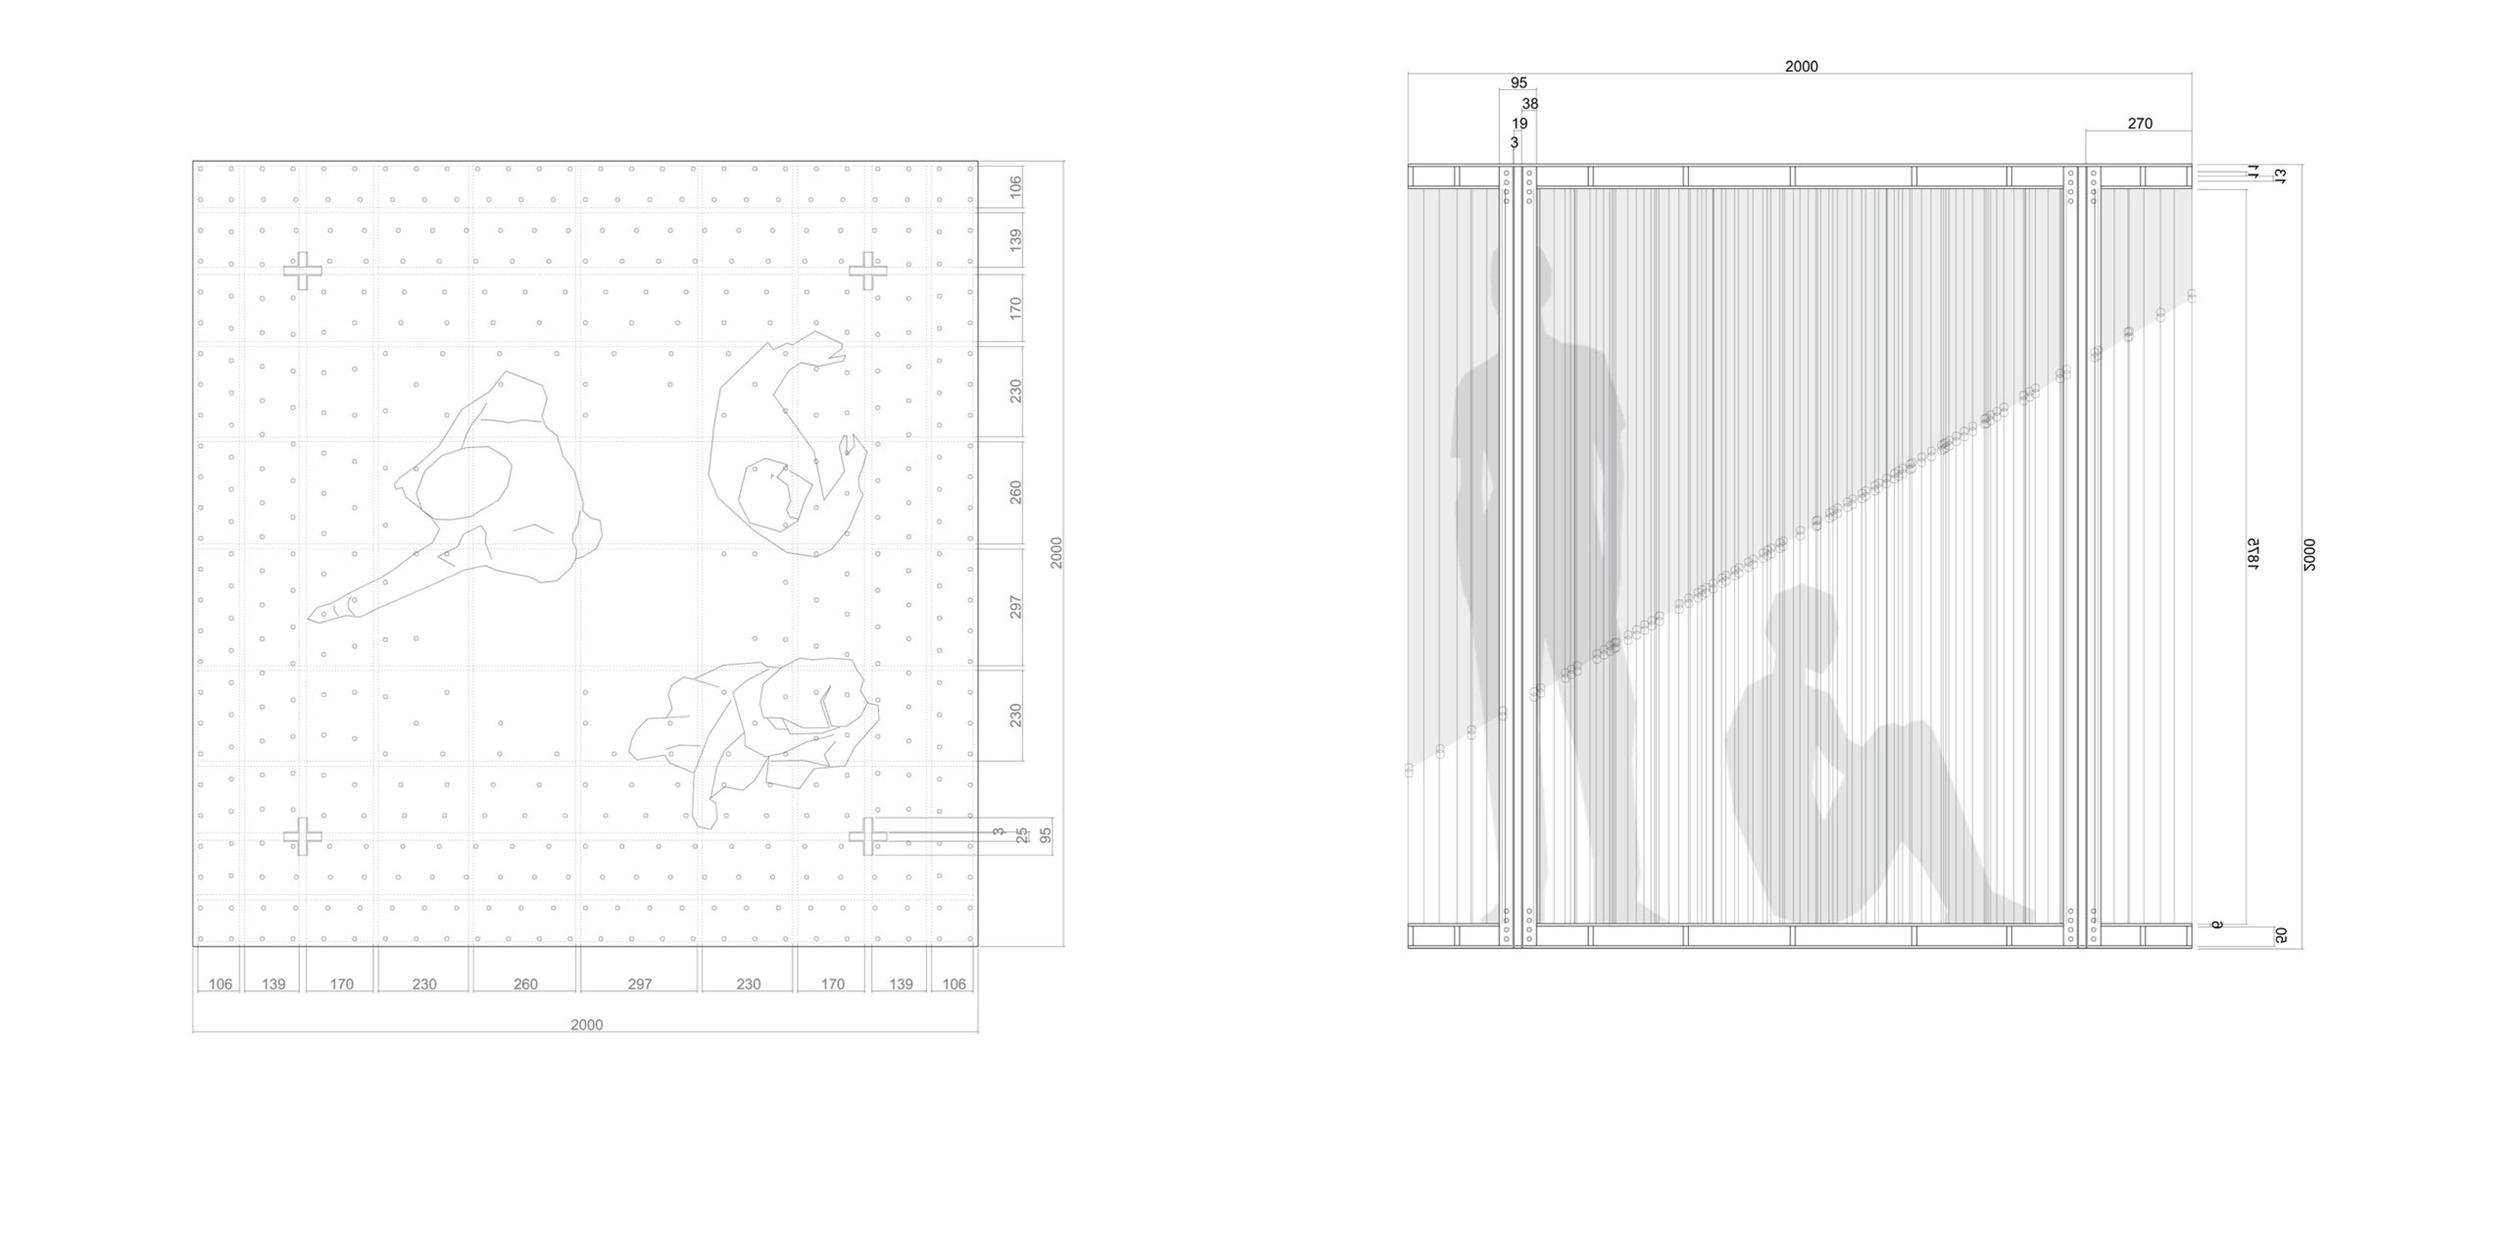 Gwangju Design Biennale 2009_Drawing_01.jpg